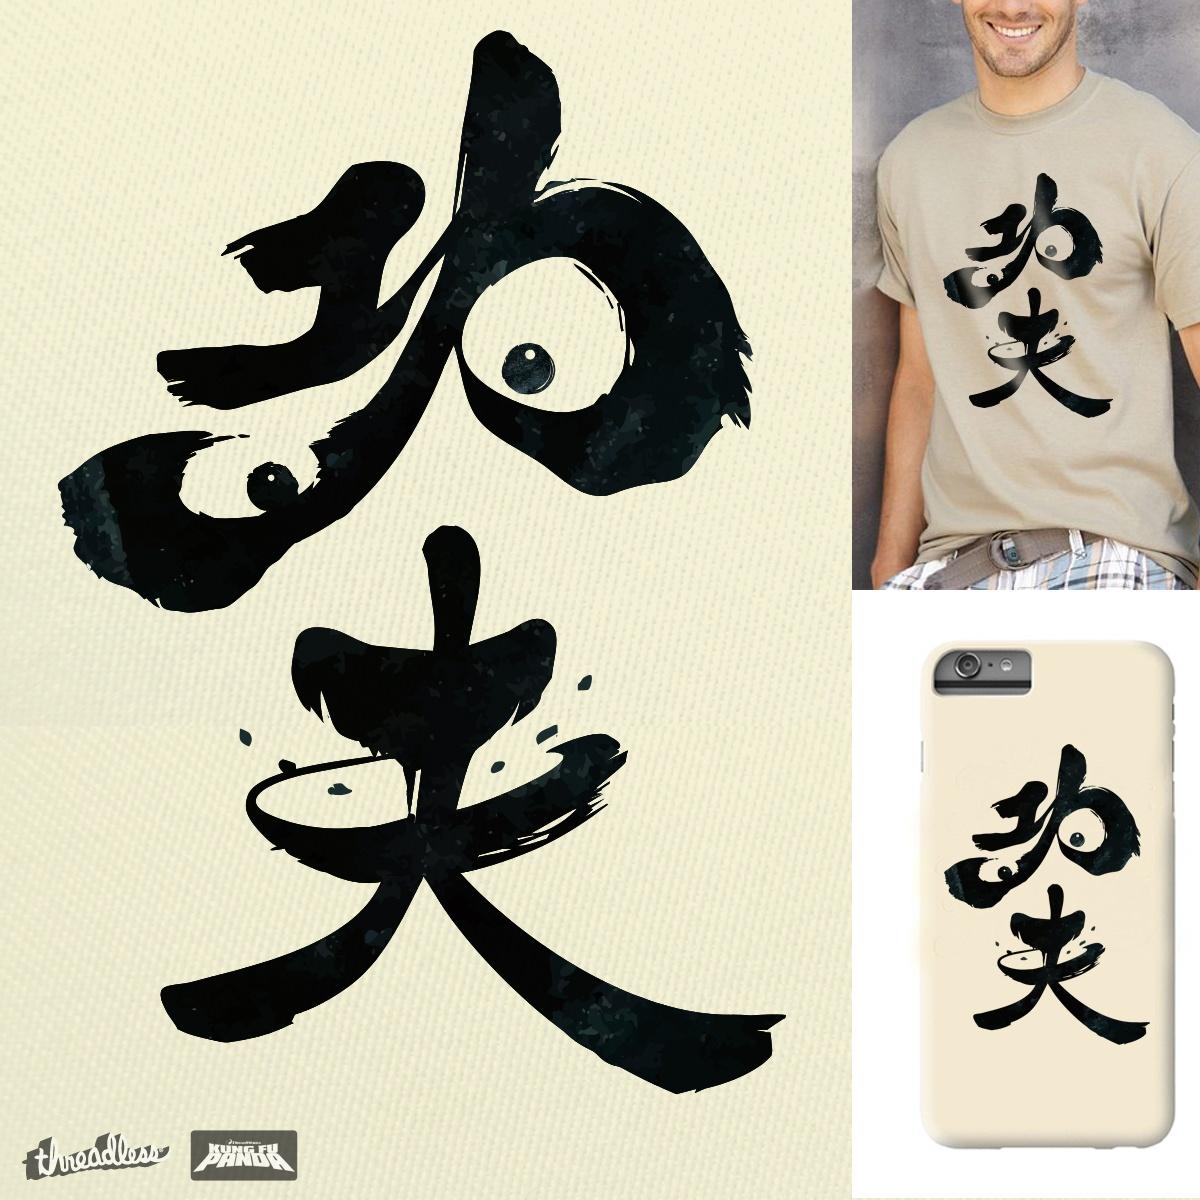 Score Po The Kung Fu Panda By Jemae On Threadless